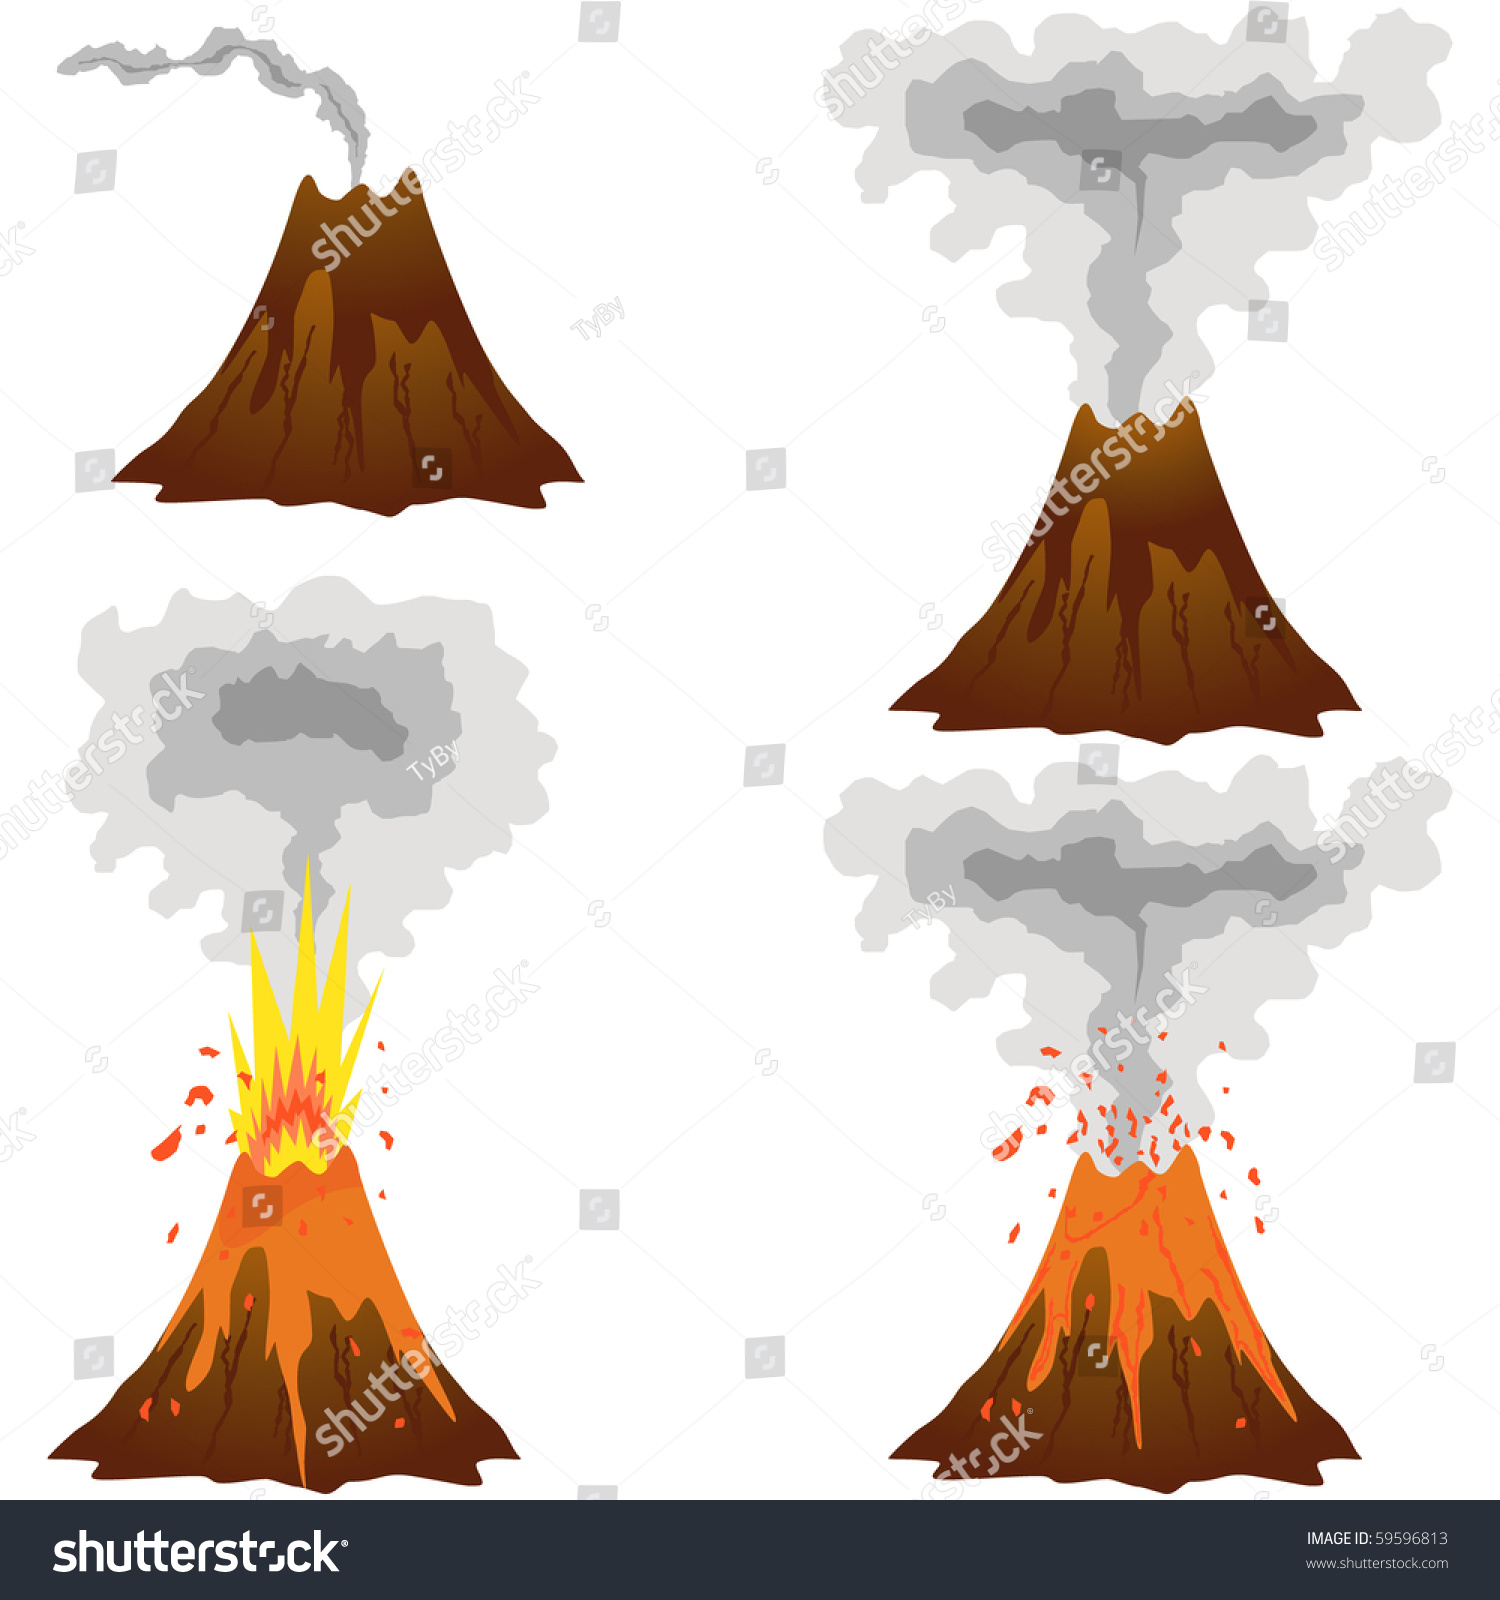 free clipart volcano erupting - photo #48